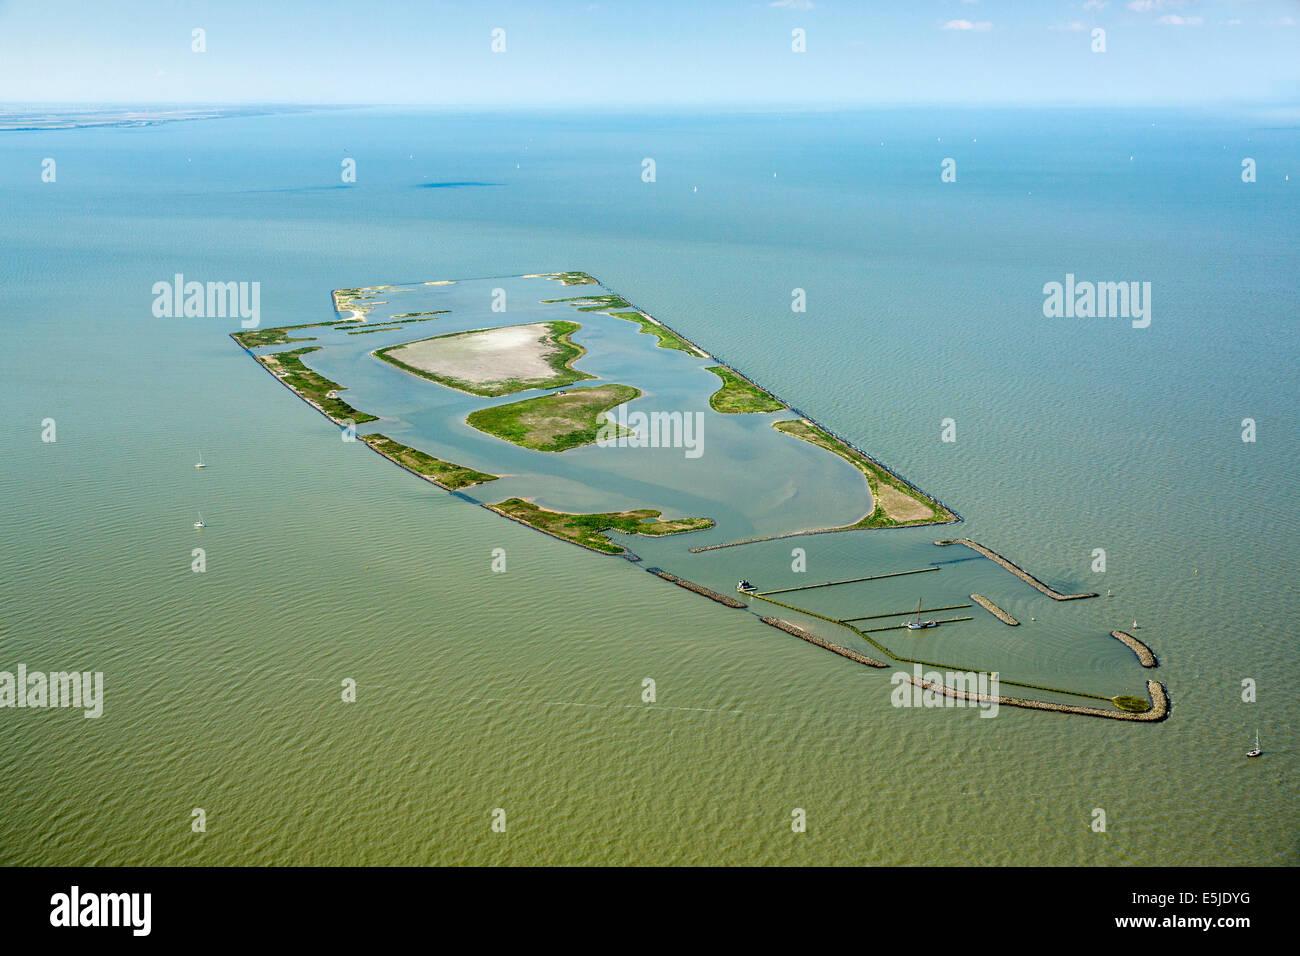 Netherlands, Andijk, Artificial island called De Kreupel, Dutch Forestry Commission. Aerial Stock Photo